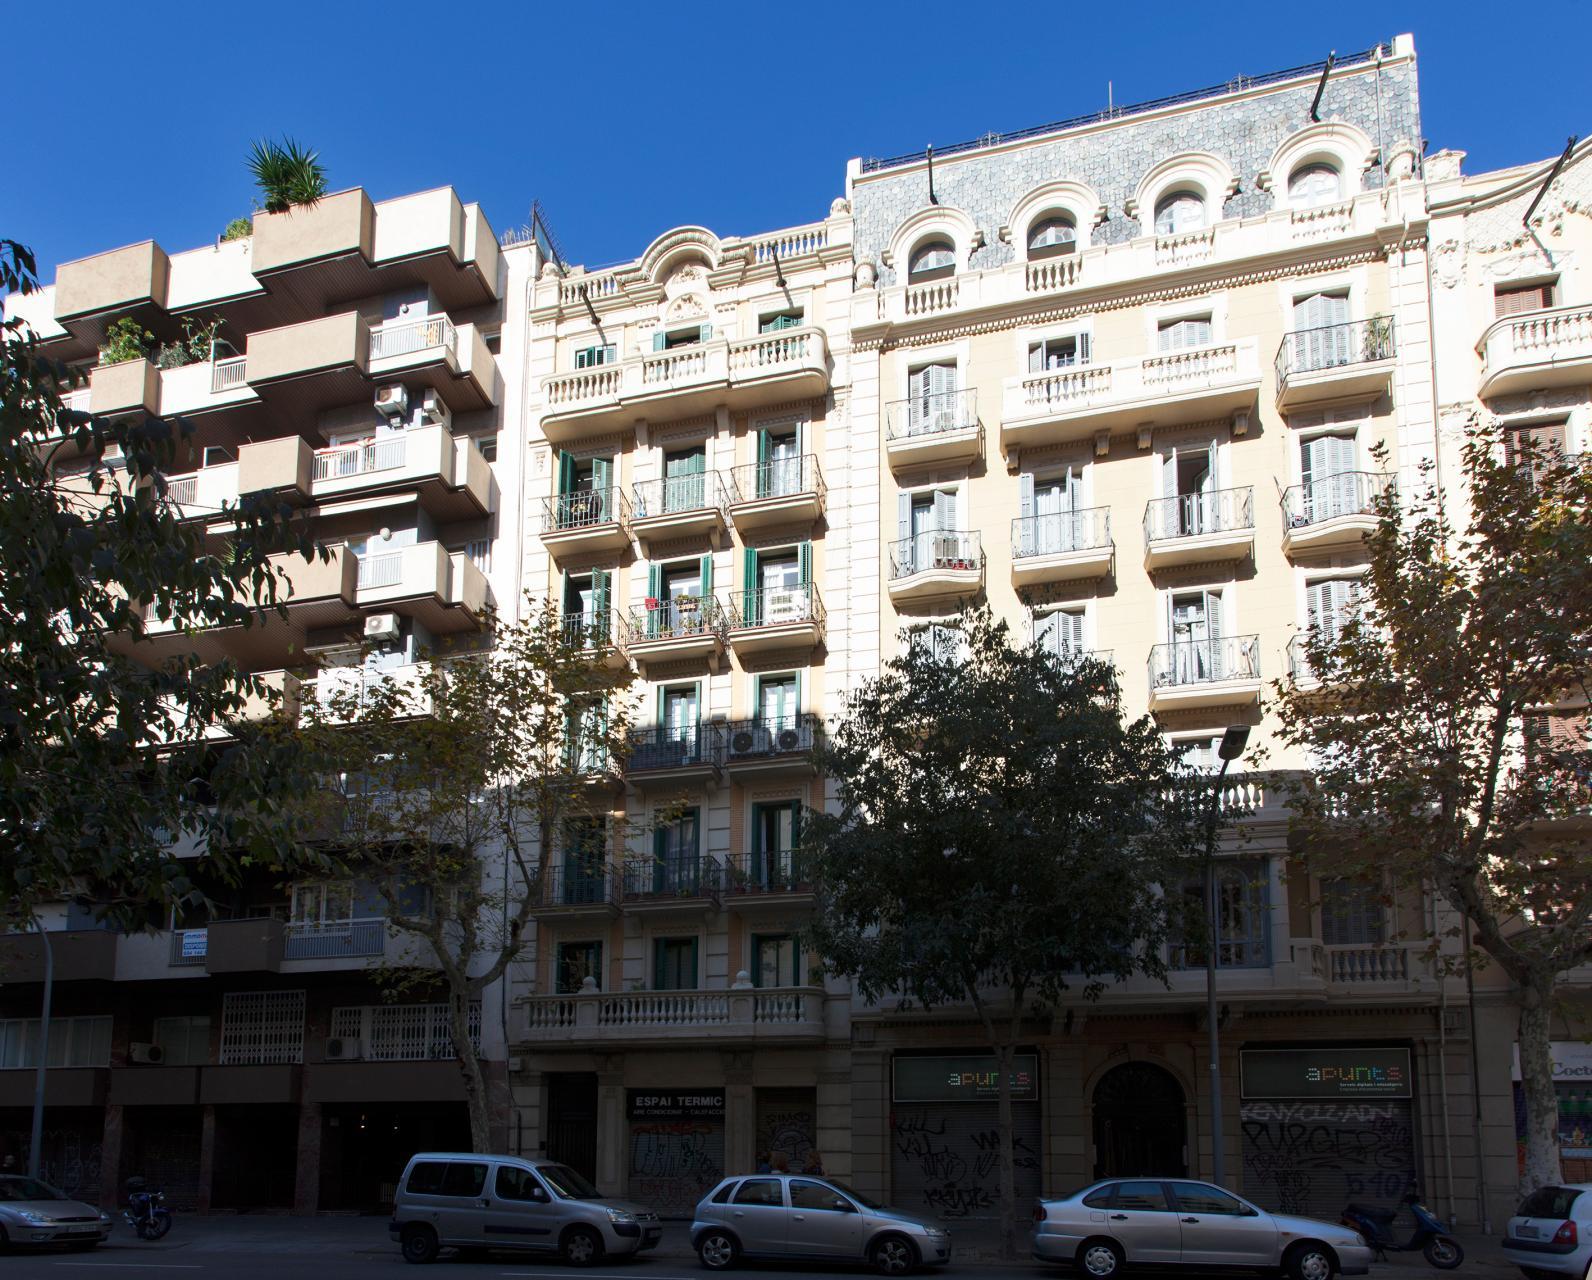 Shbarcelona alquiler piso eixample izquierdo consell cent - Alquiler pisos barcelona eixample ...